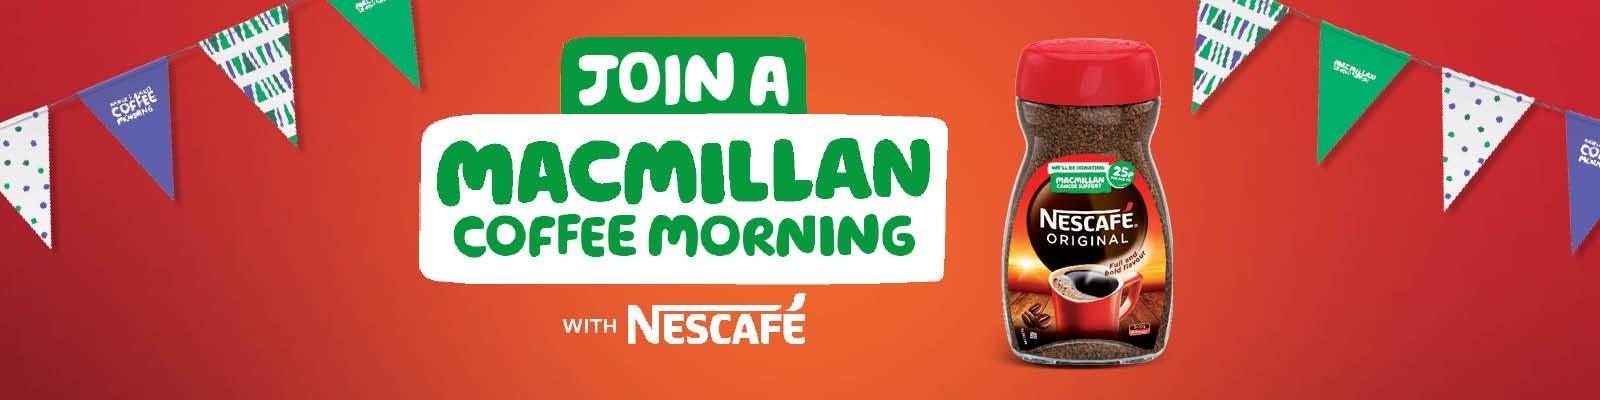 Macmillan Coffee Morning with NESCAFÉ Original